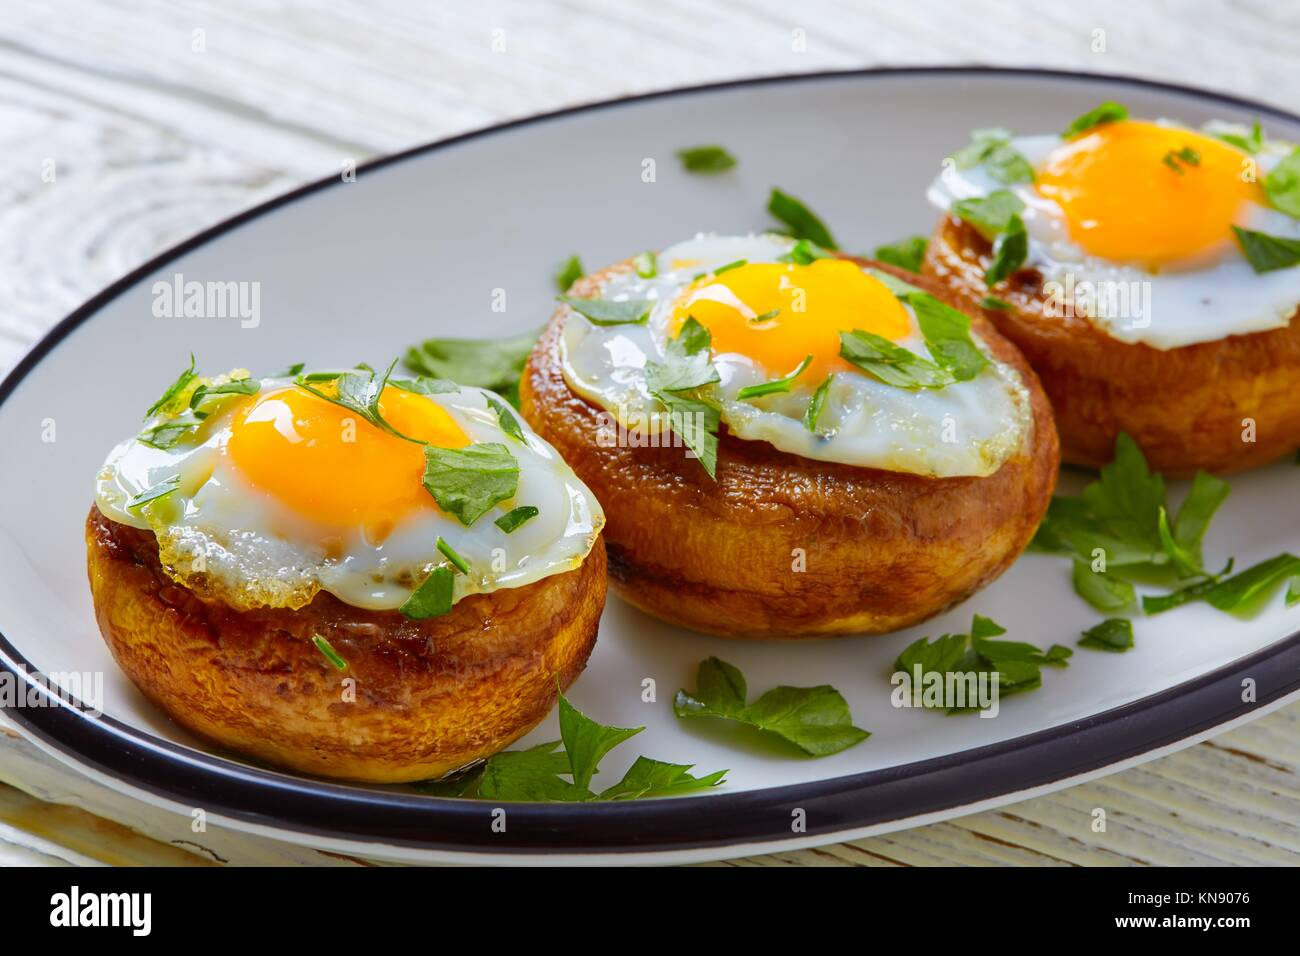 Tapas mushrooms with quail eggs from Spain pinchos pintxos. Stock Photo